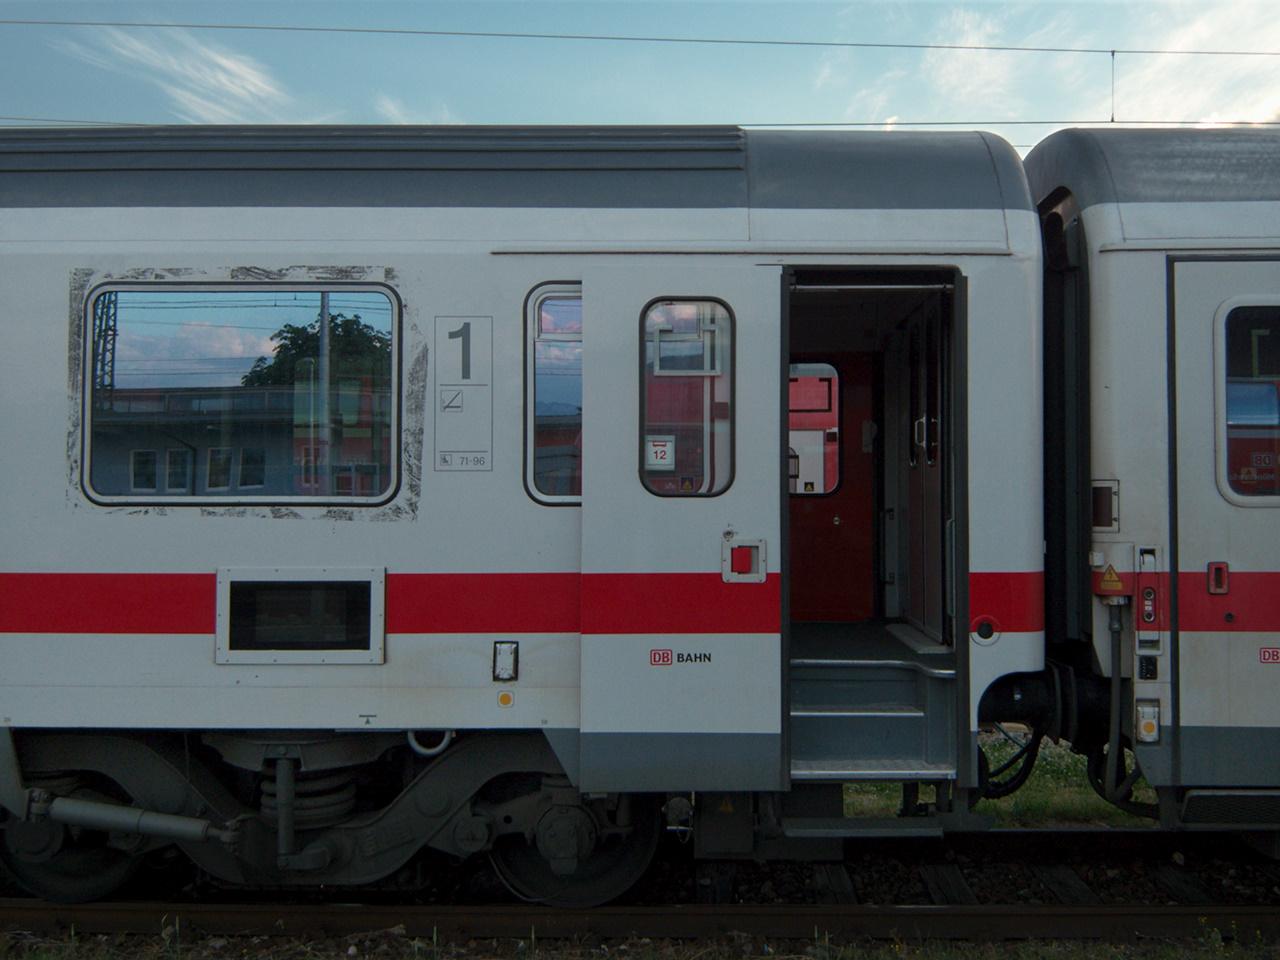 Click to enlarge: DB Coach [f/2.8, 1/250 sec, 6mm-e, ISO 100, DMC-LX3]